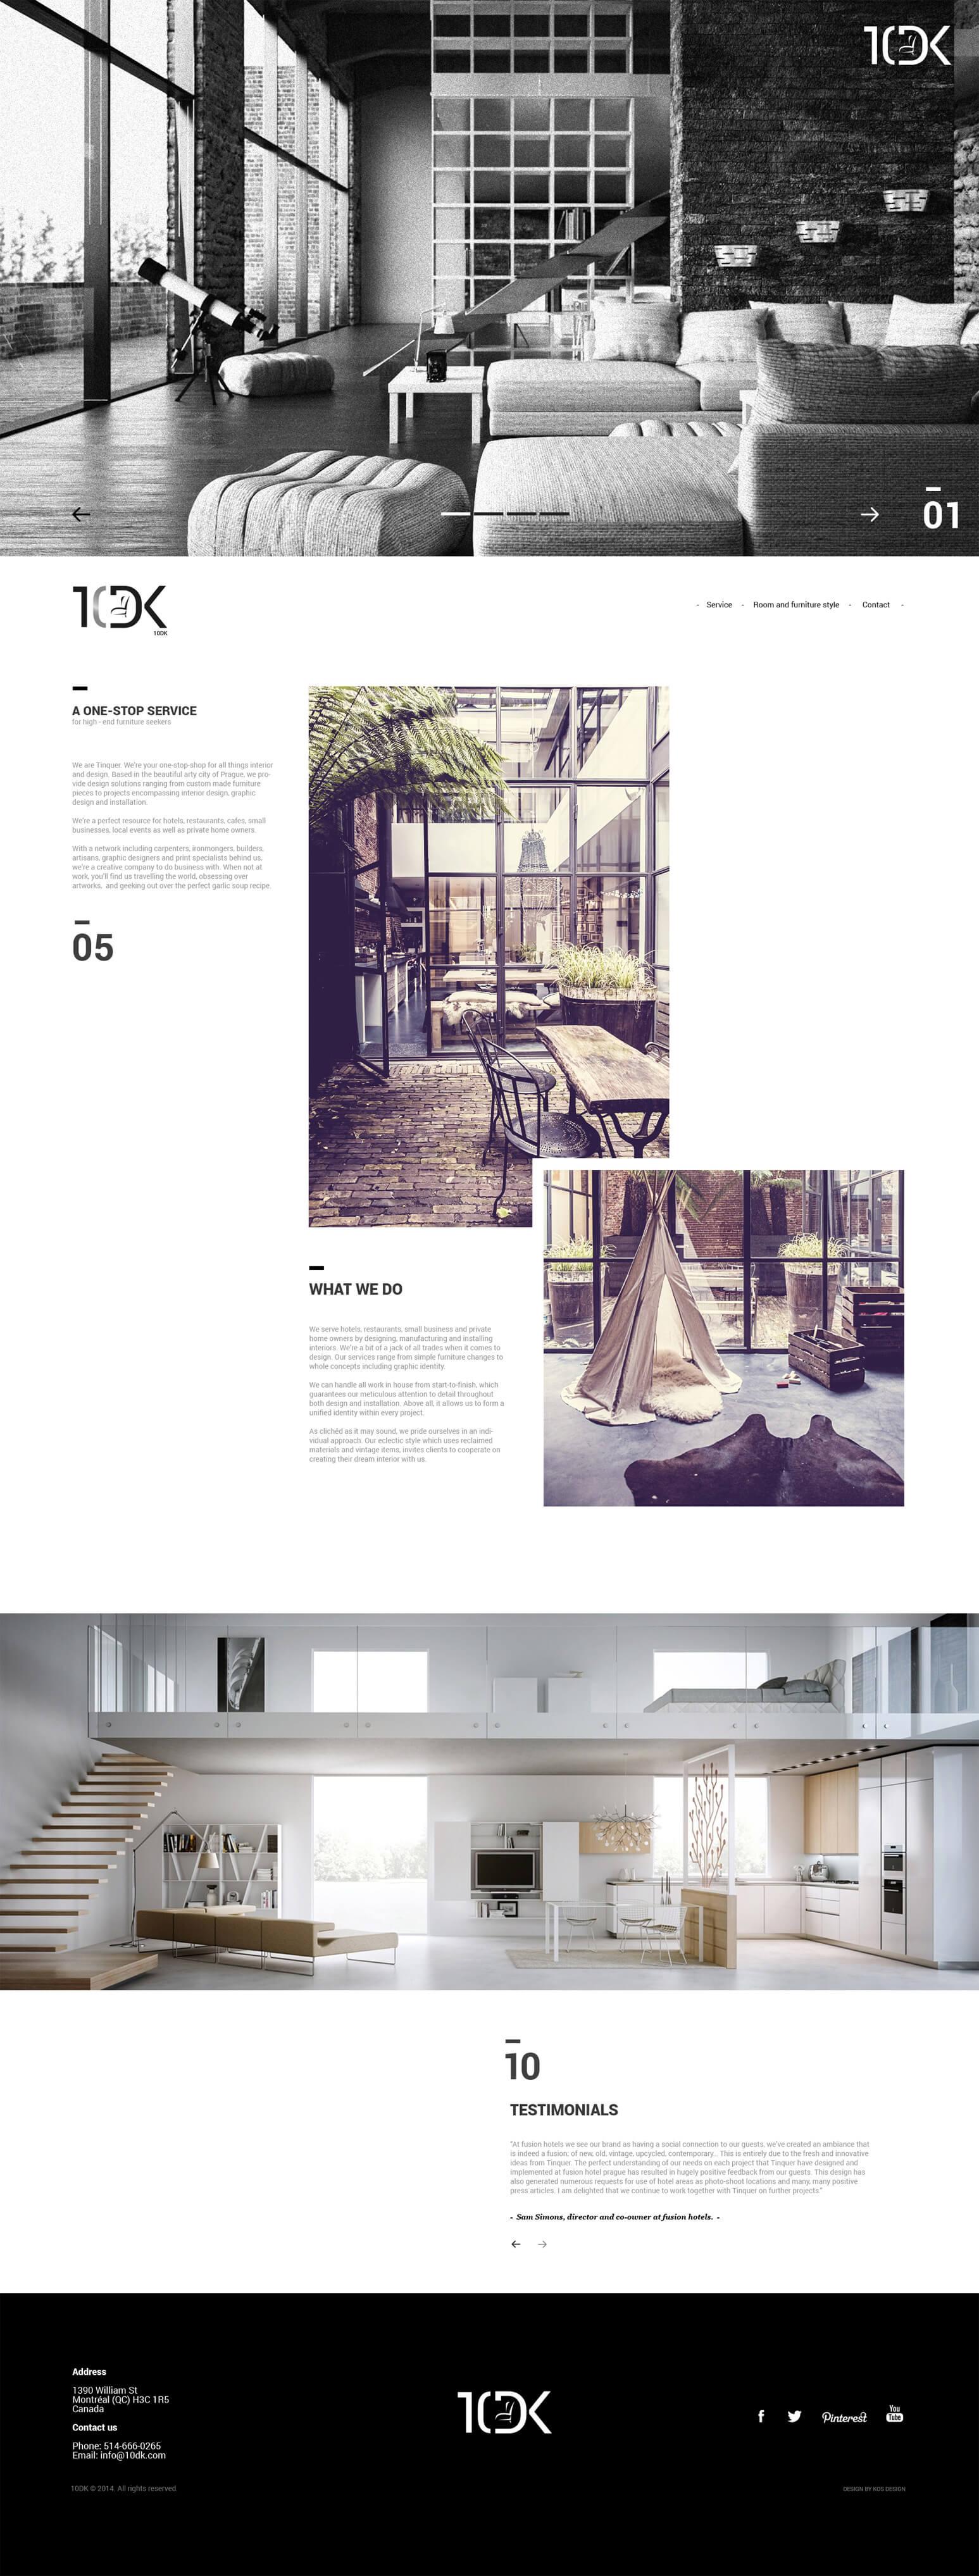 KOS Design - 10DK